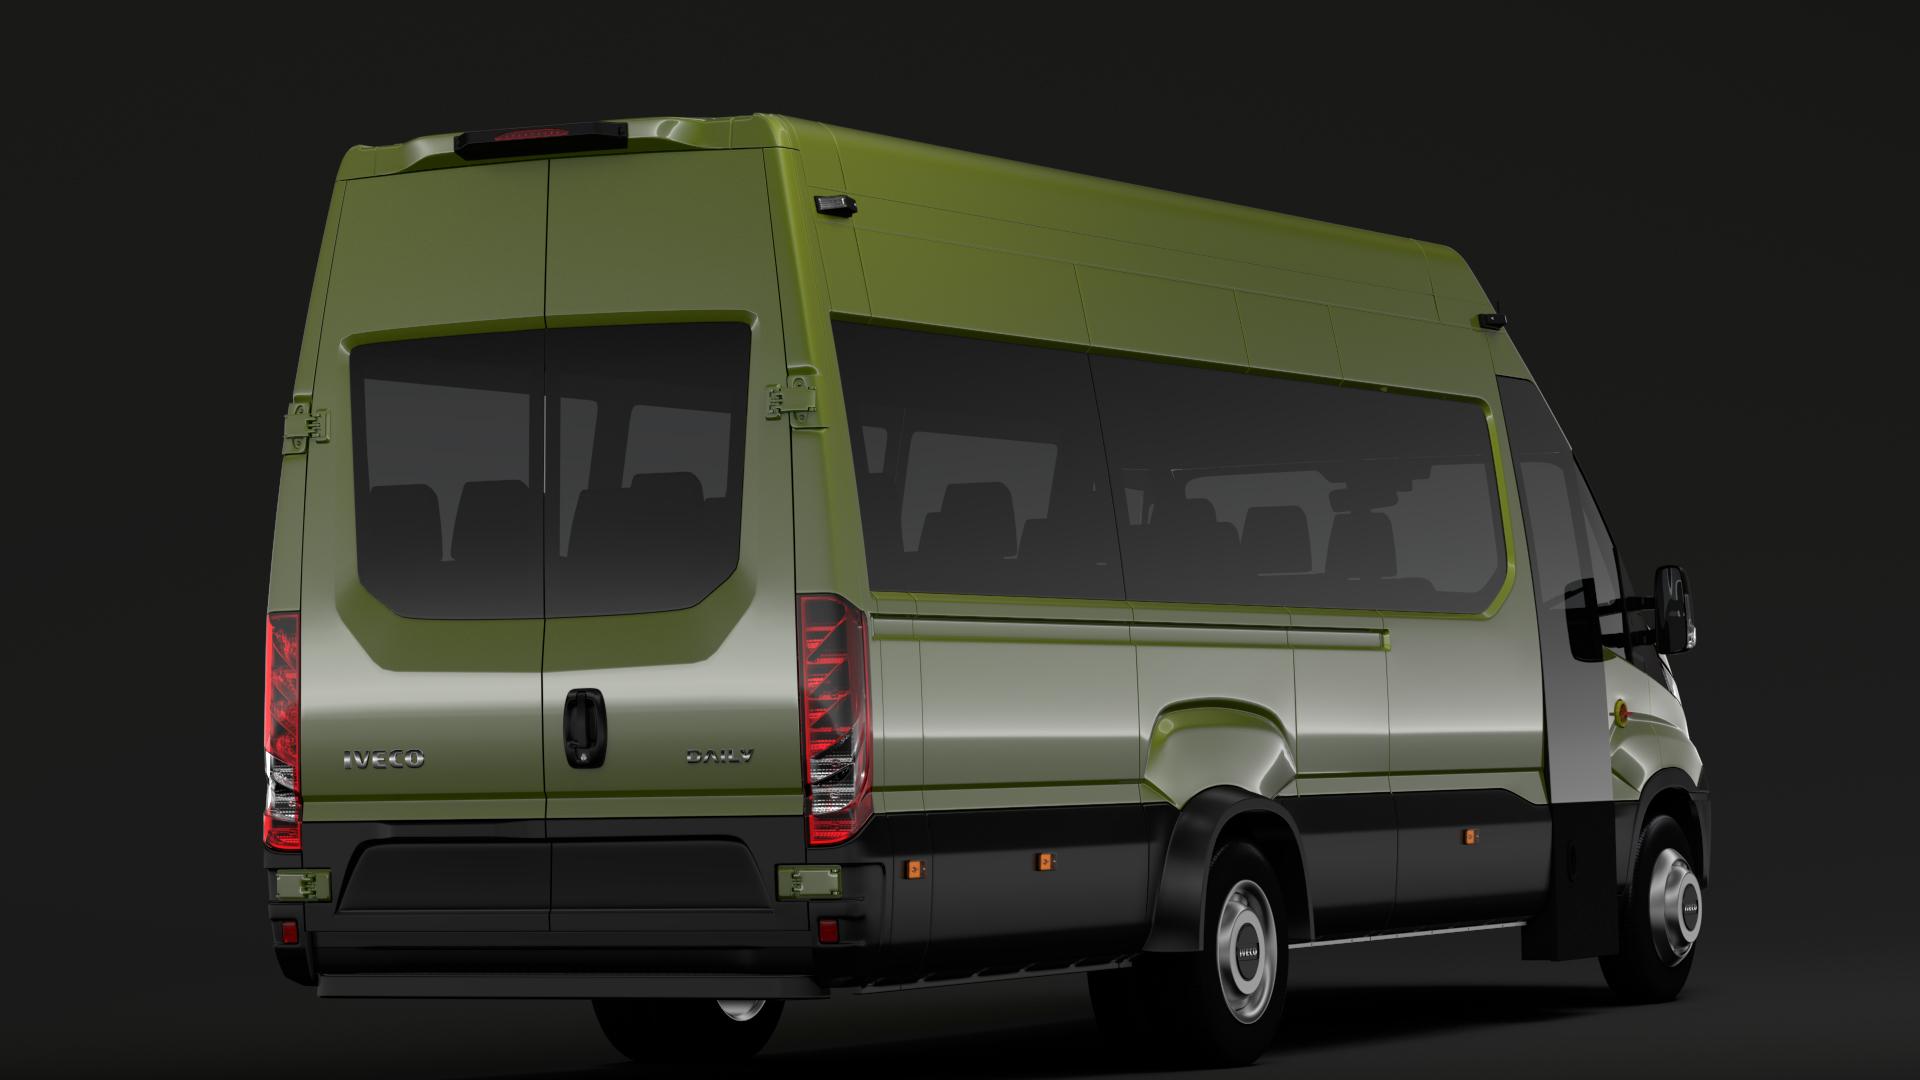 iveco daily tourus l5h3 20014-2016 3d model max fbx c4d lwo ma mb hrc xsi obj 275707